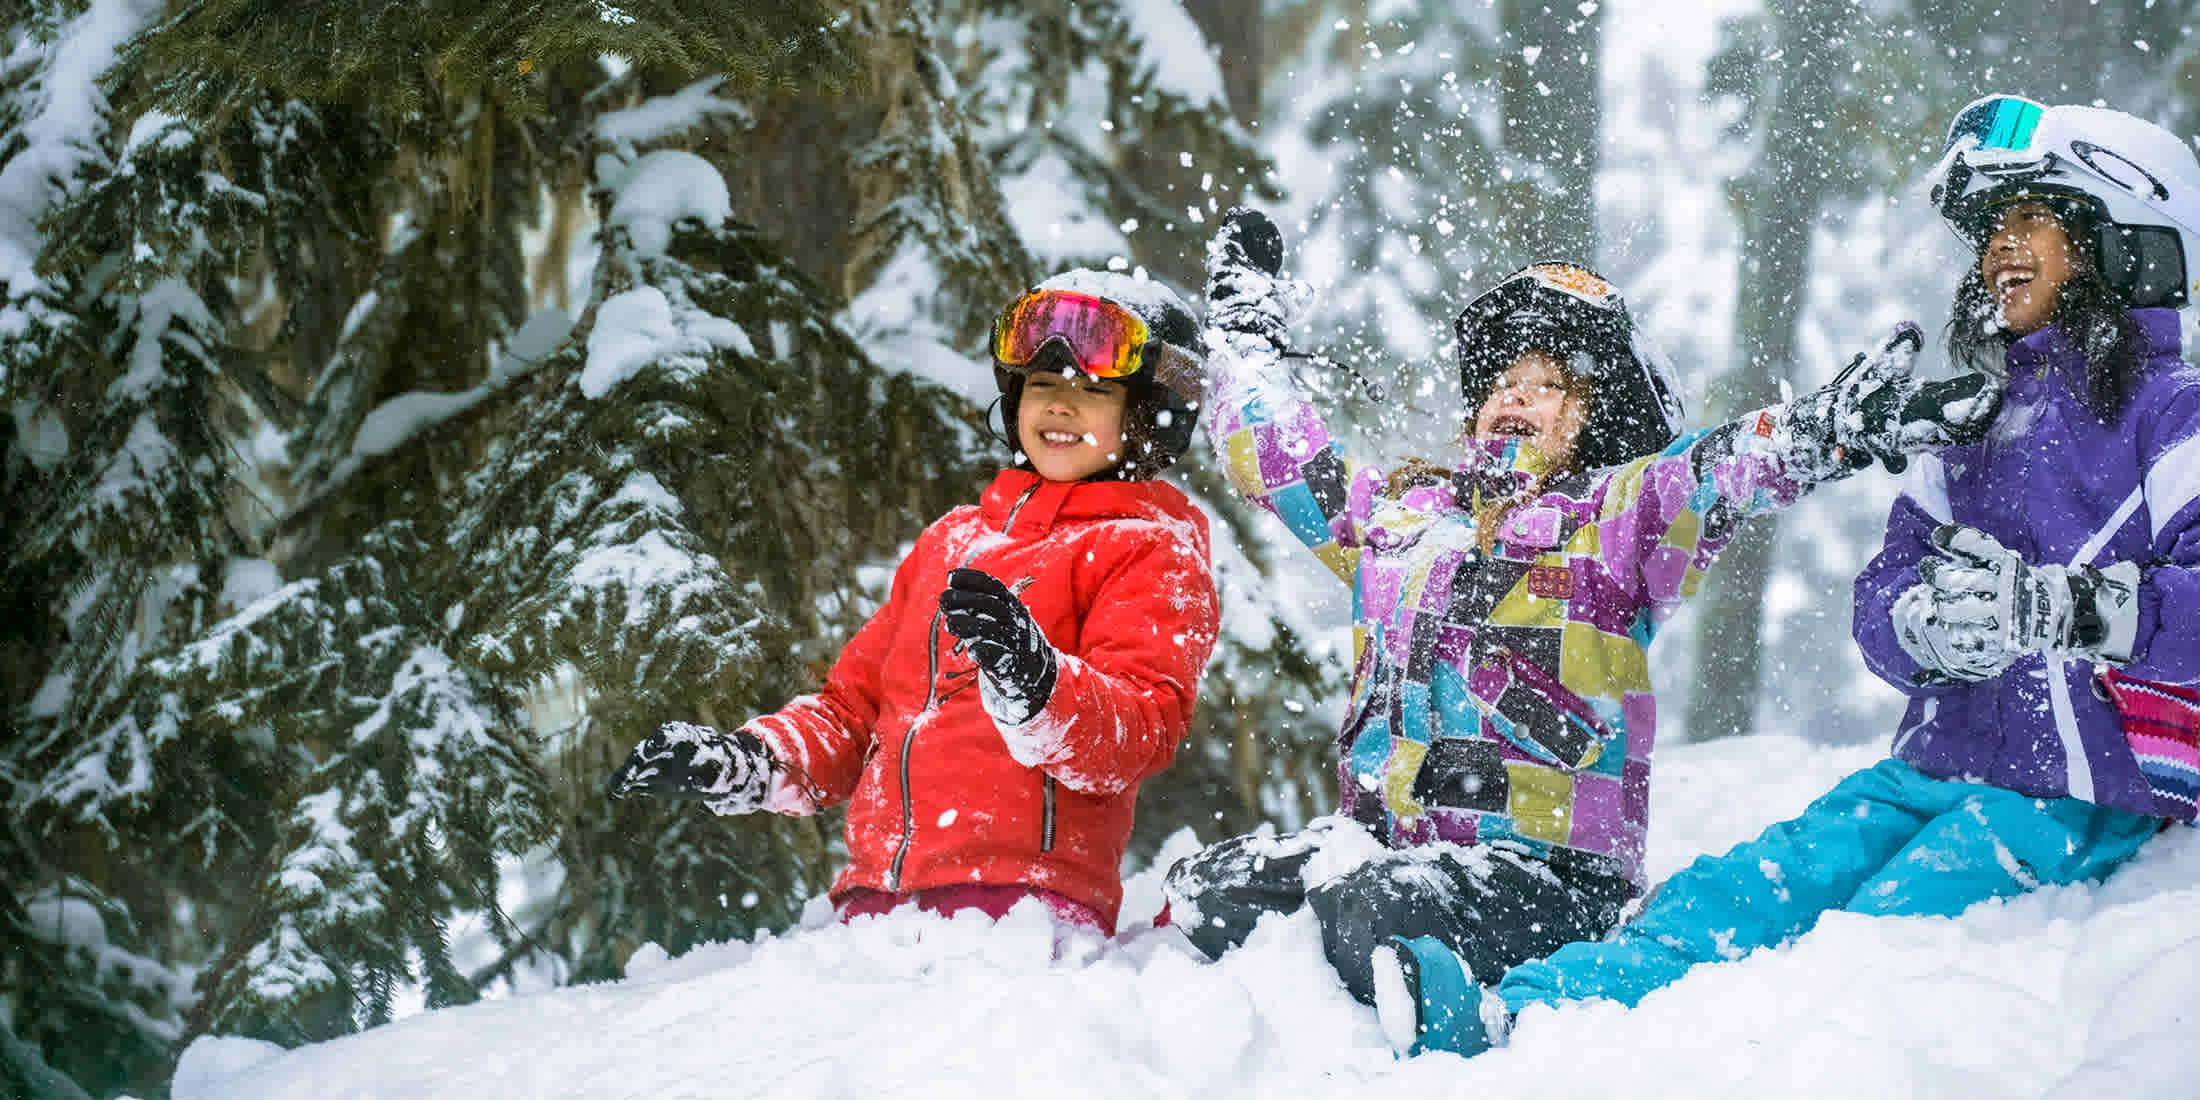 Children skiing at Whistler Blackcomb